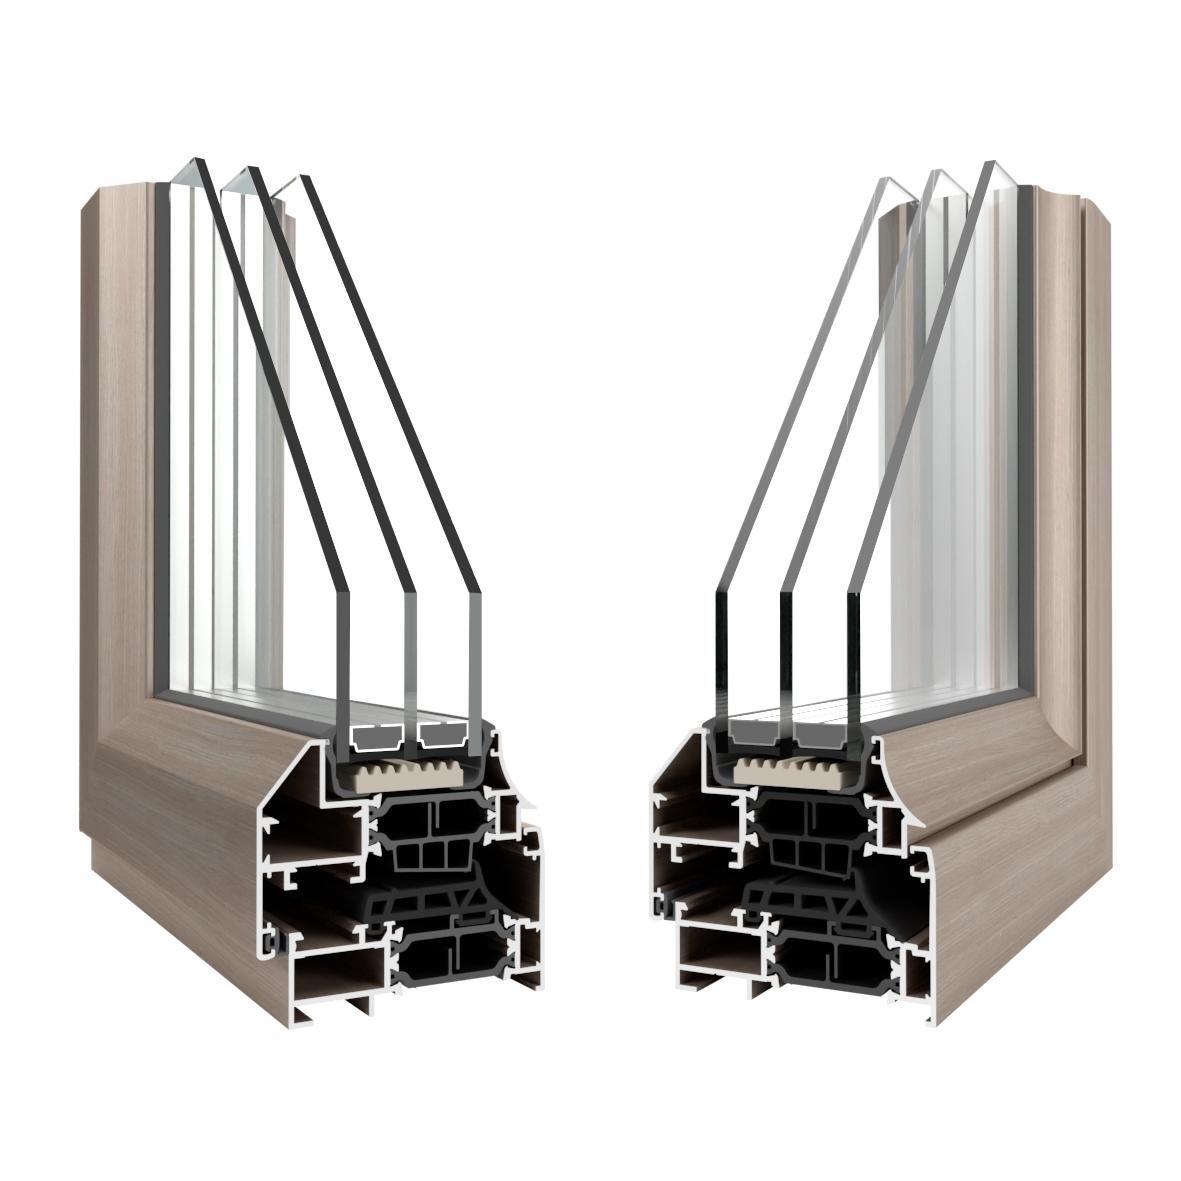 https://www.allpaint.it/wp-content/uploads/2021/07/smartline-basic-alluminio-allpaint.jpg